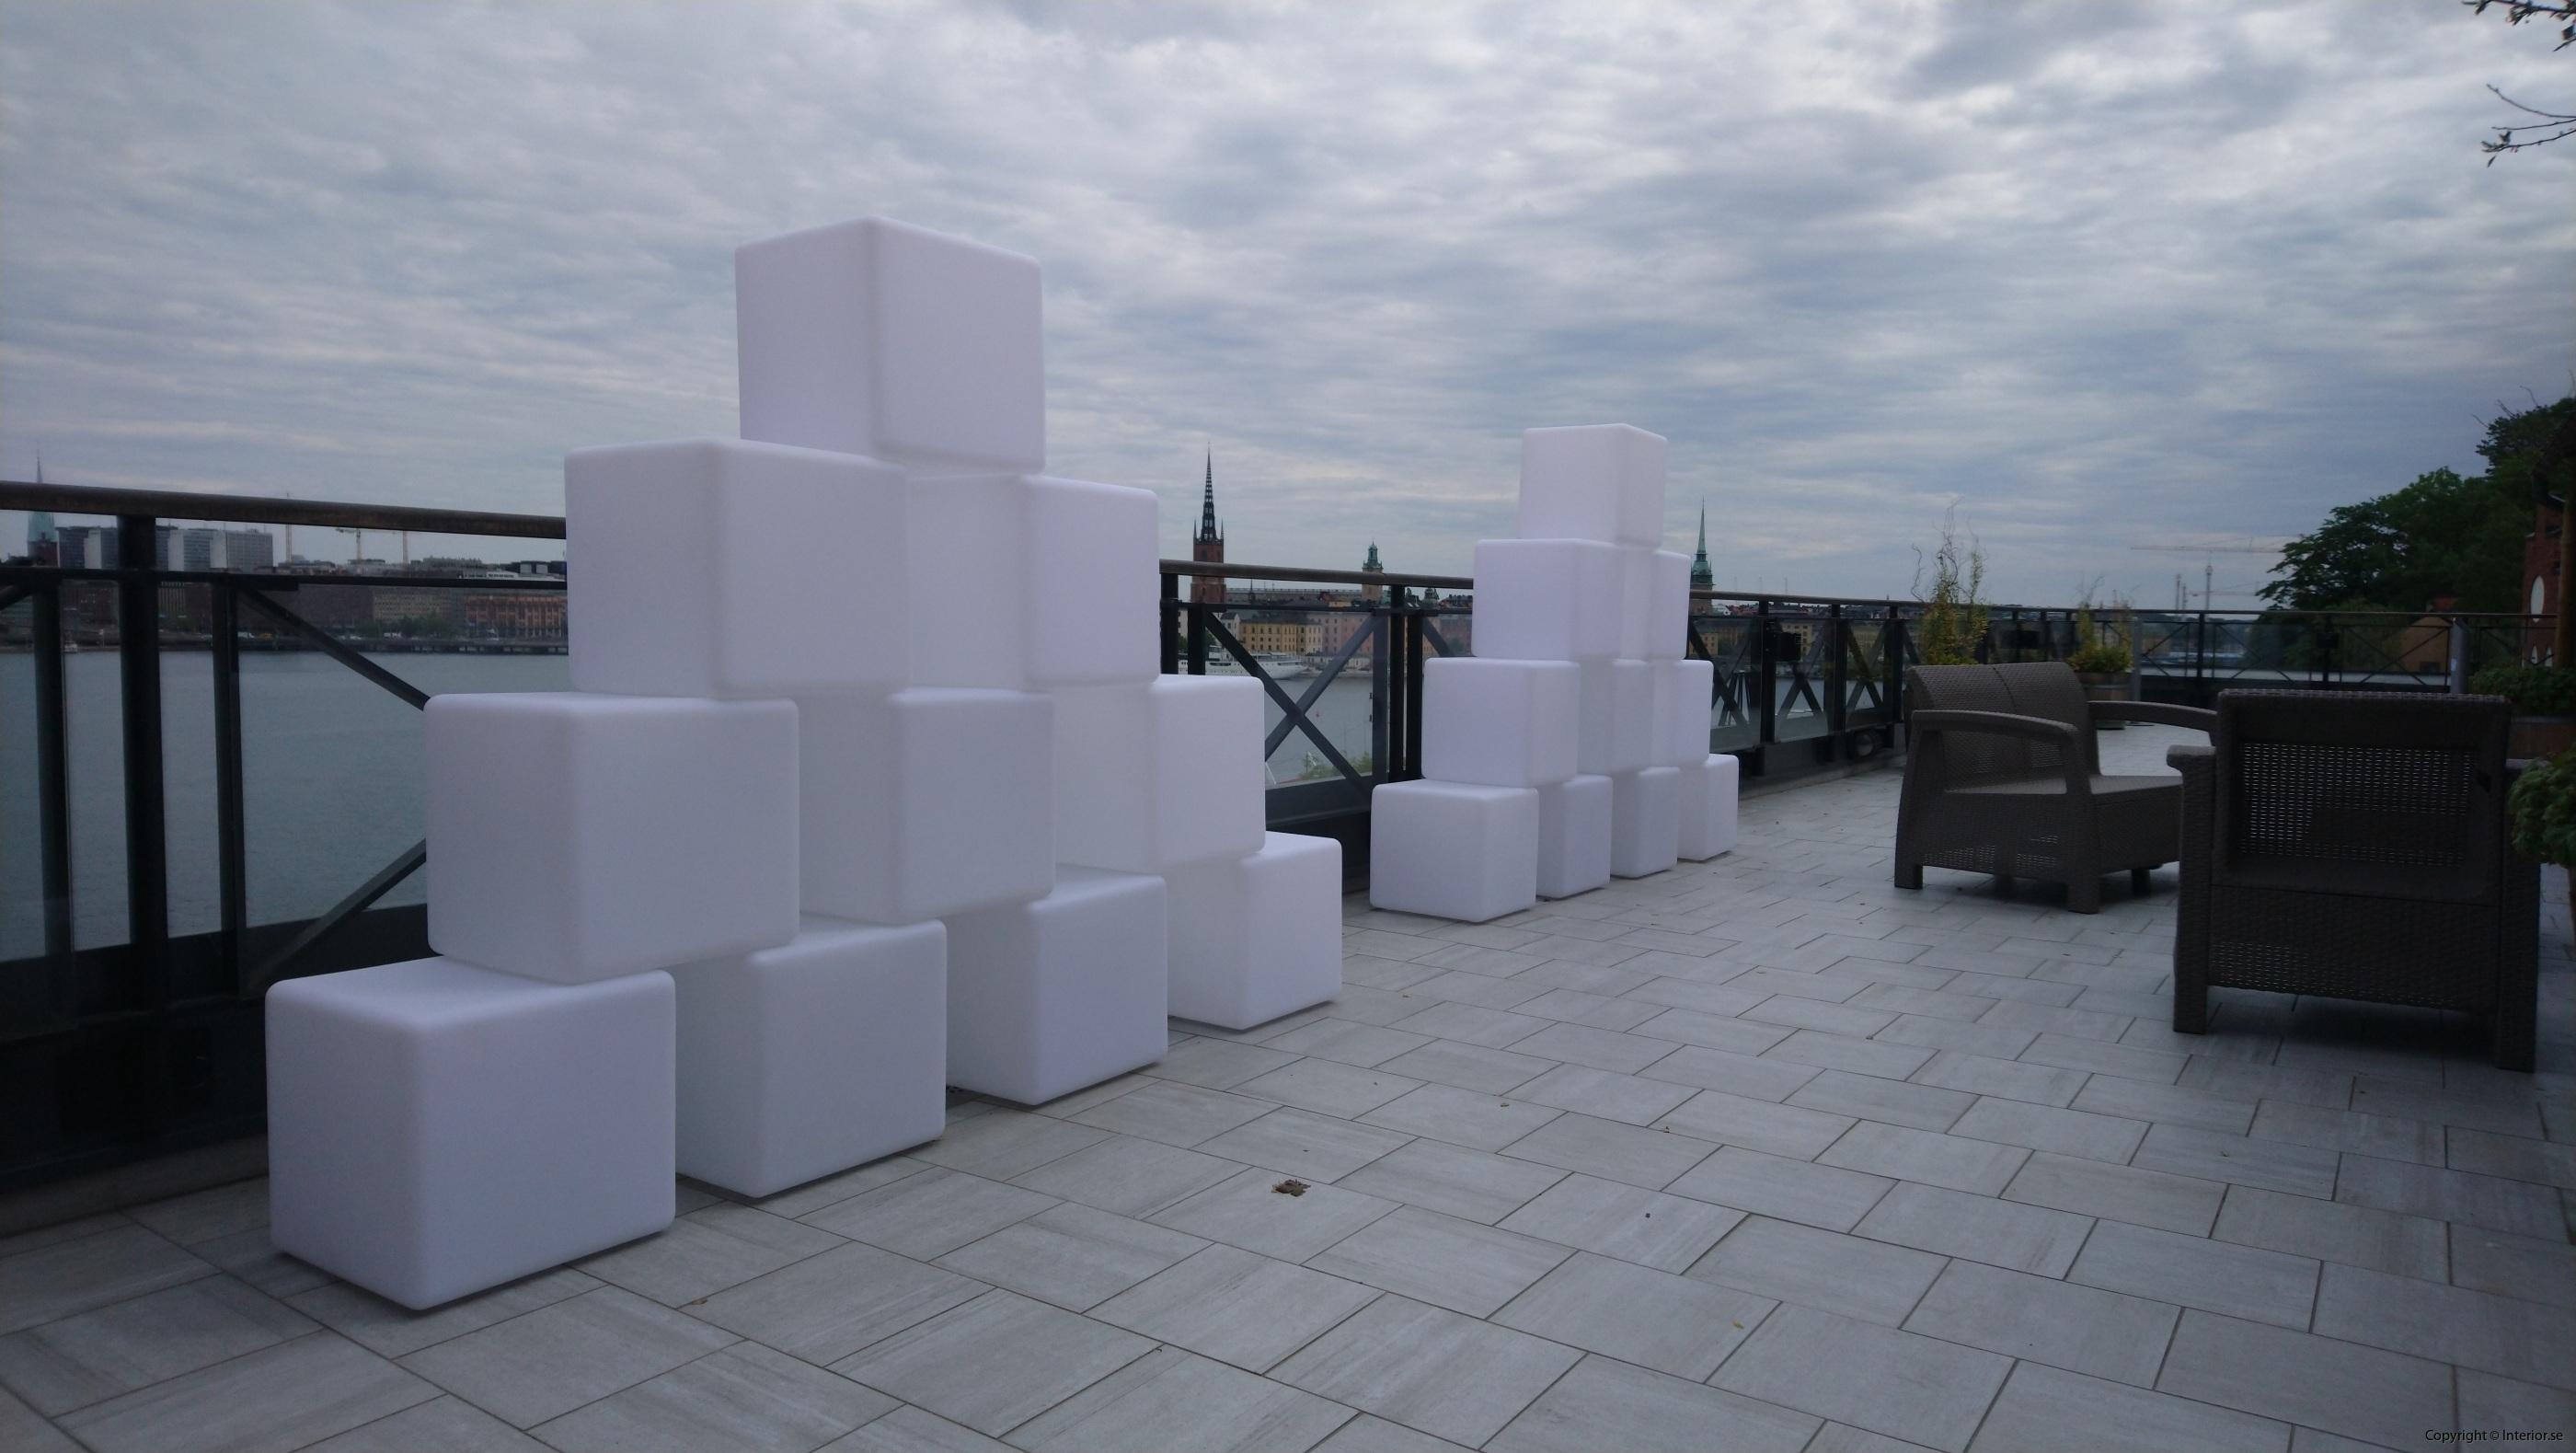 Hyra LED kuber  Pallar 40 x 40 cm - RGB LED hyra möbler event stockholm (3)